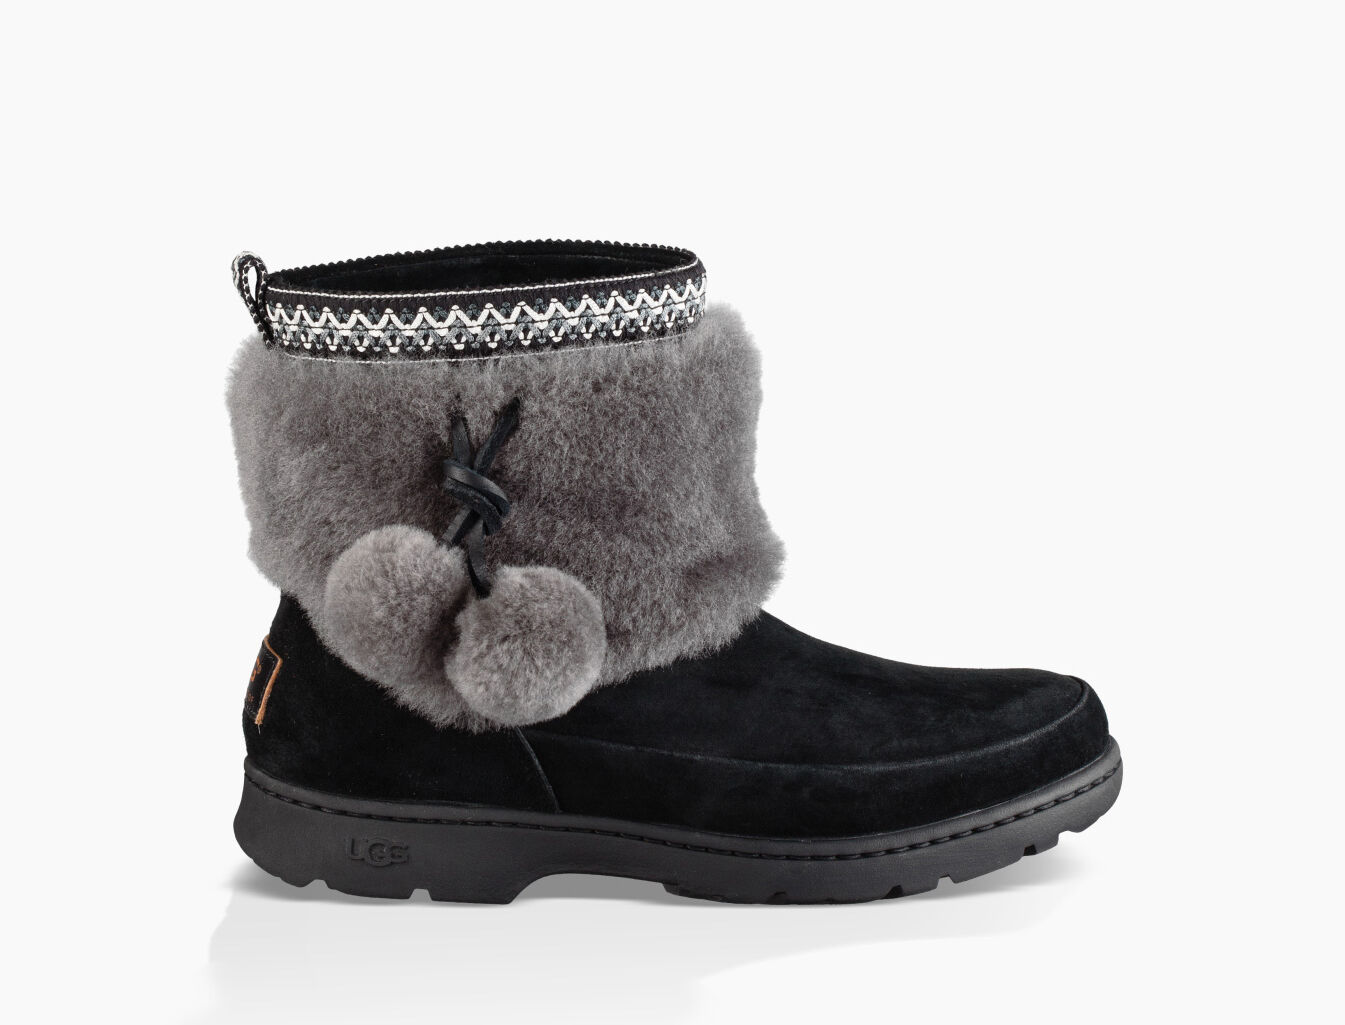 ugg official women s brie sheepskin cuff boots ugg com rh ugg com